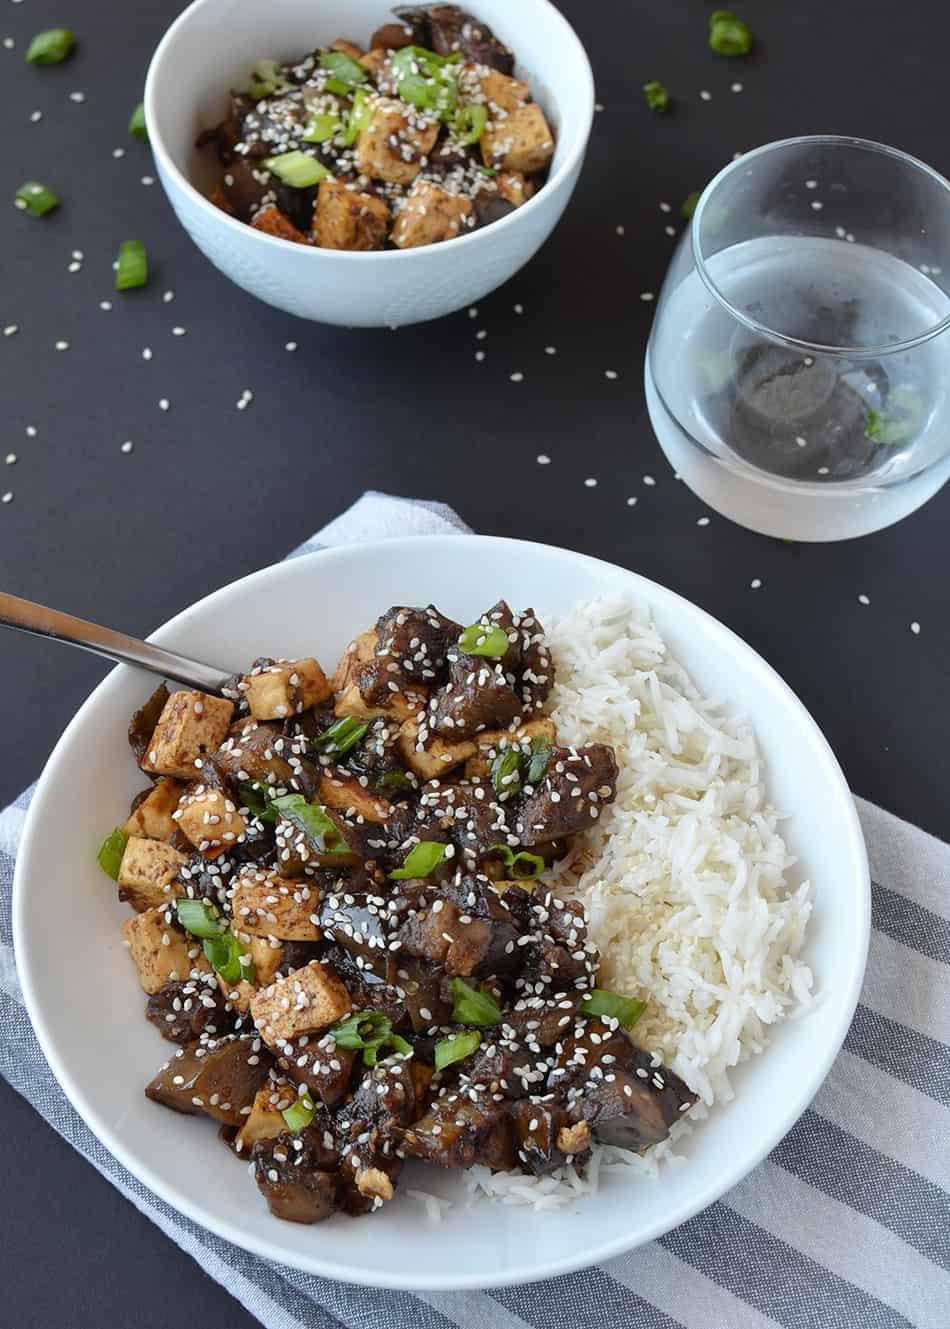 Vegan Eggplant Teriyaki Stir-Fry